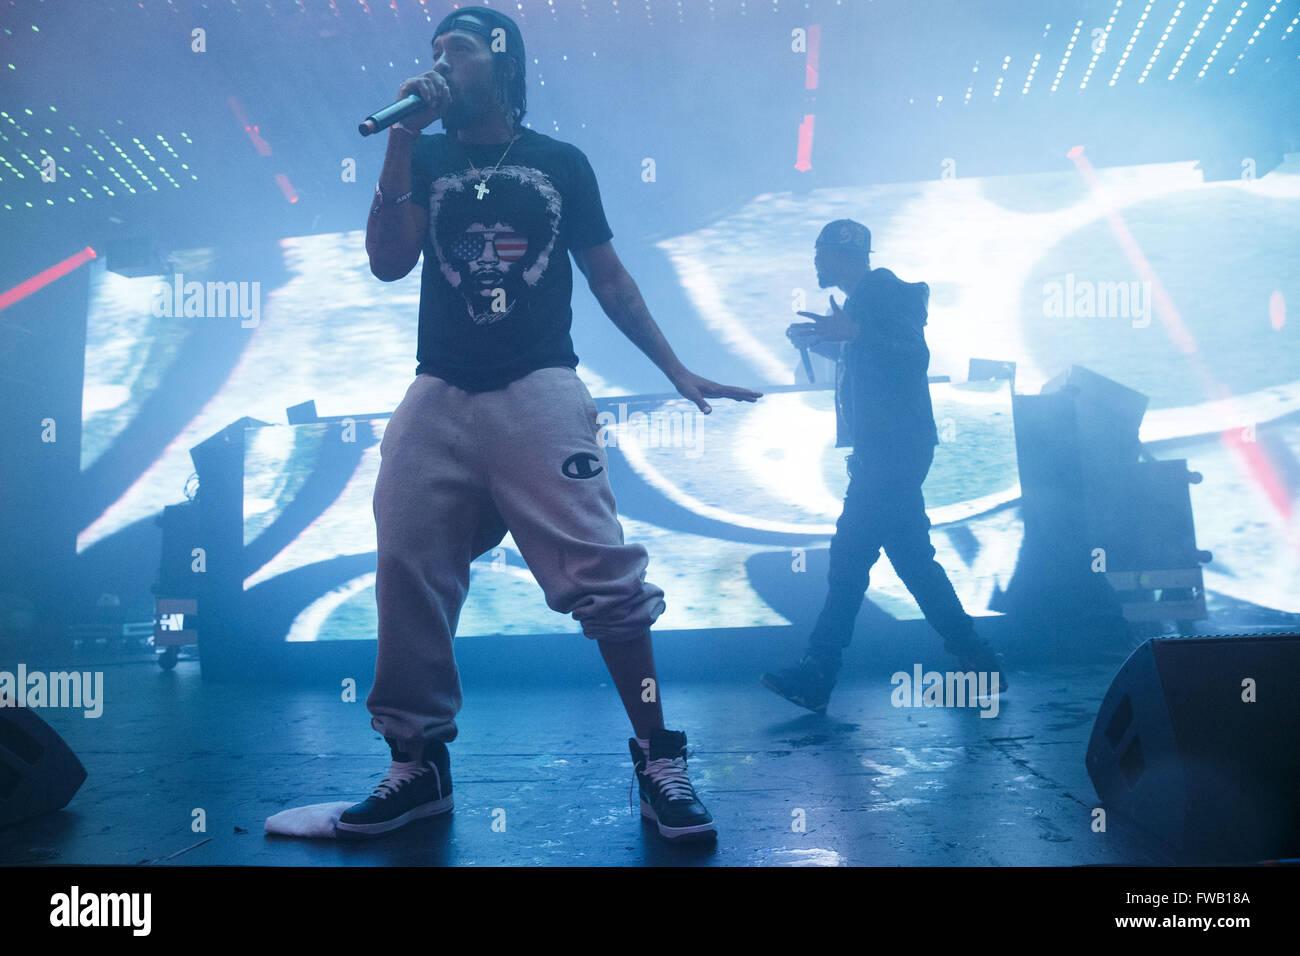 Method Man Stock Photos & Method Man Stock Images - Alamy